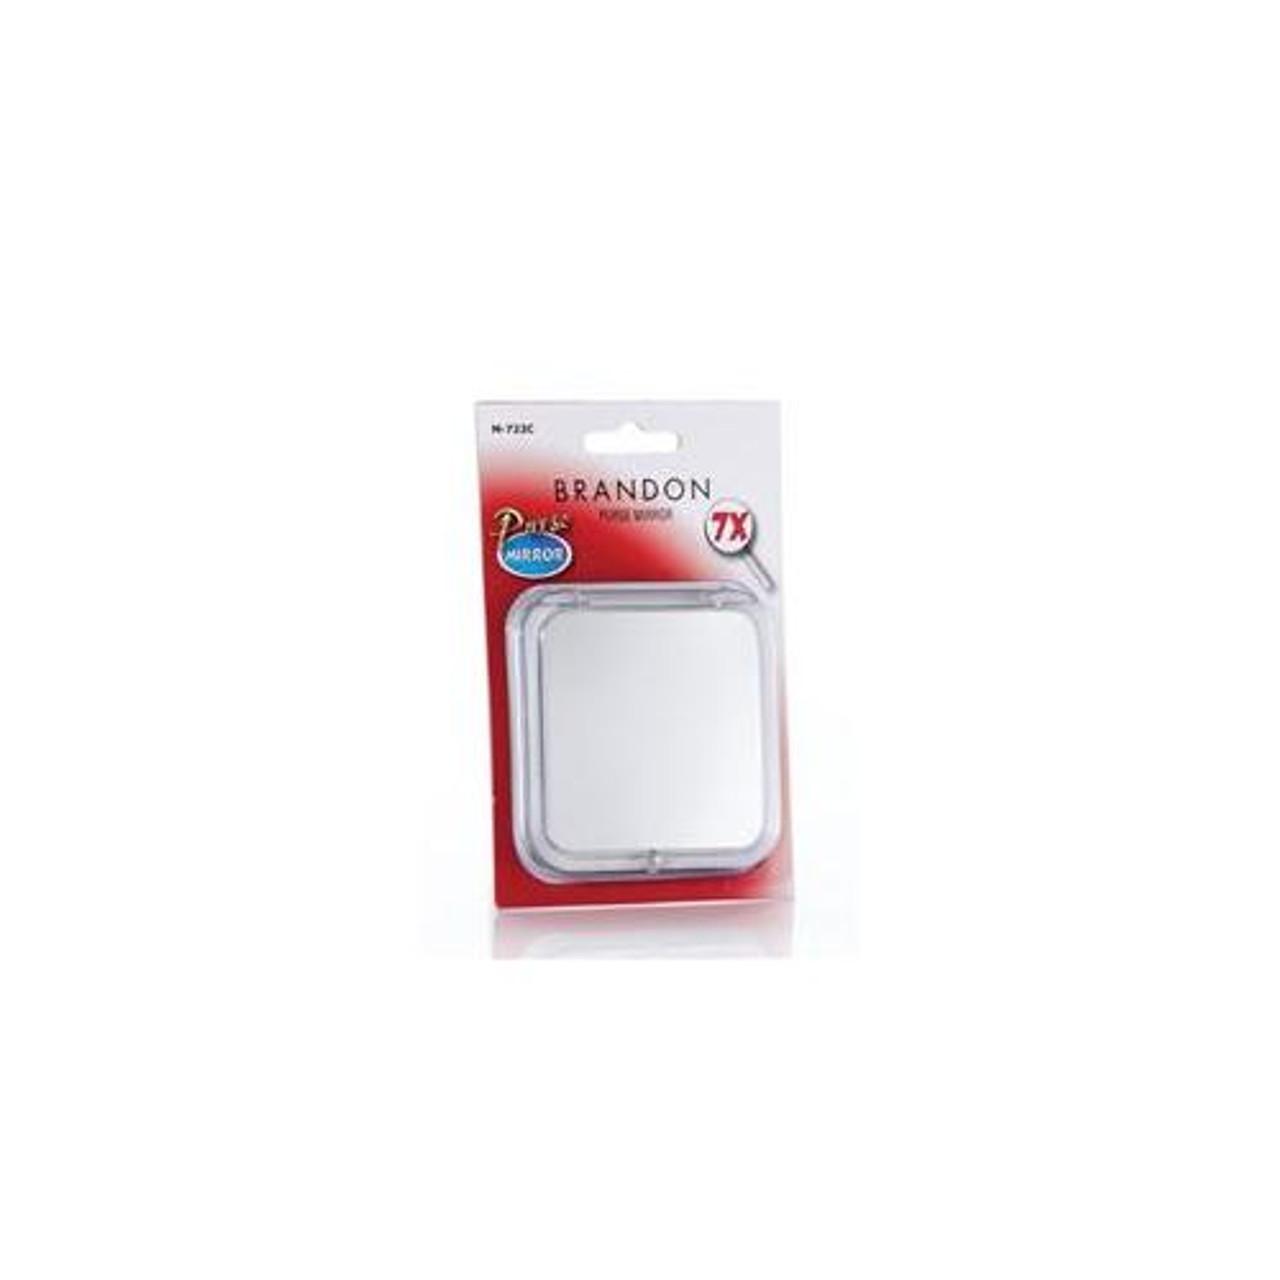 "7X Compact Travel Mirror 4"""